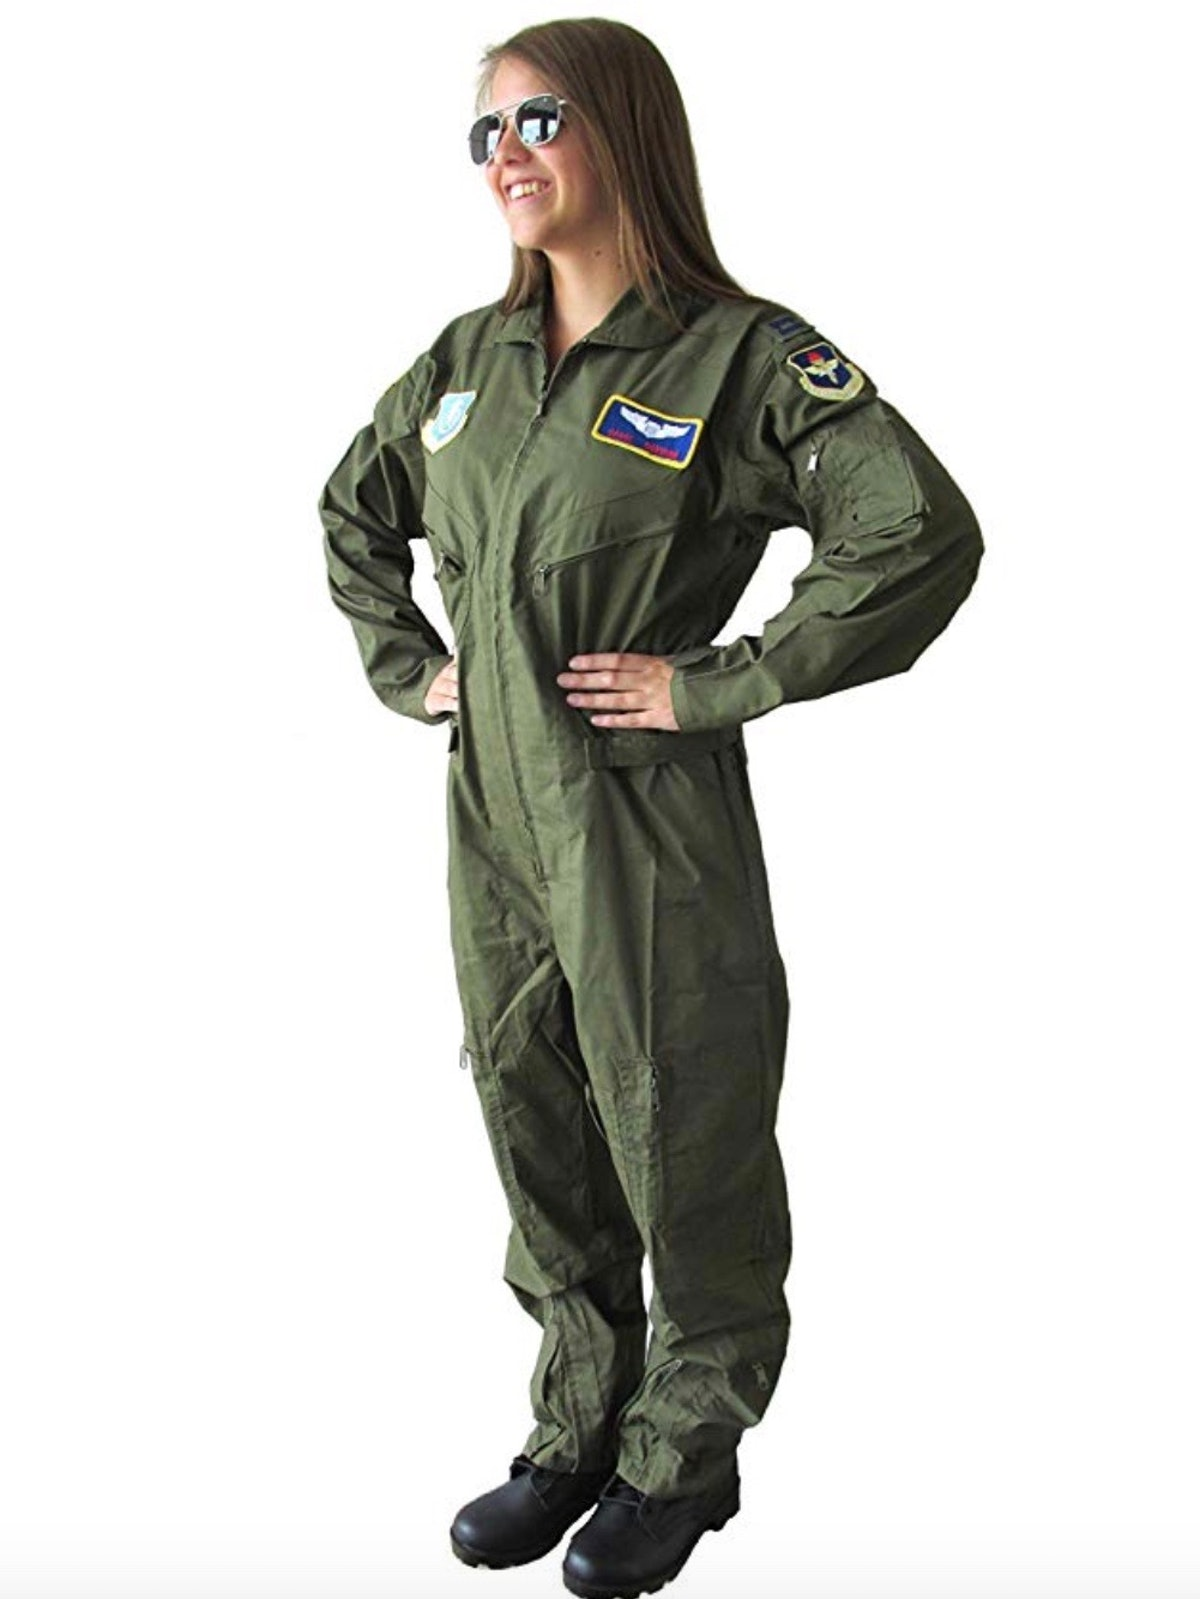 Military Uniform Supply Carol Danvers Air Force Costume - Carol Danvers Cosplay Flight Suit